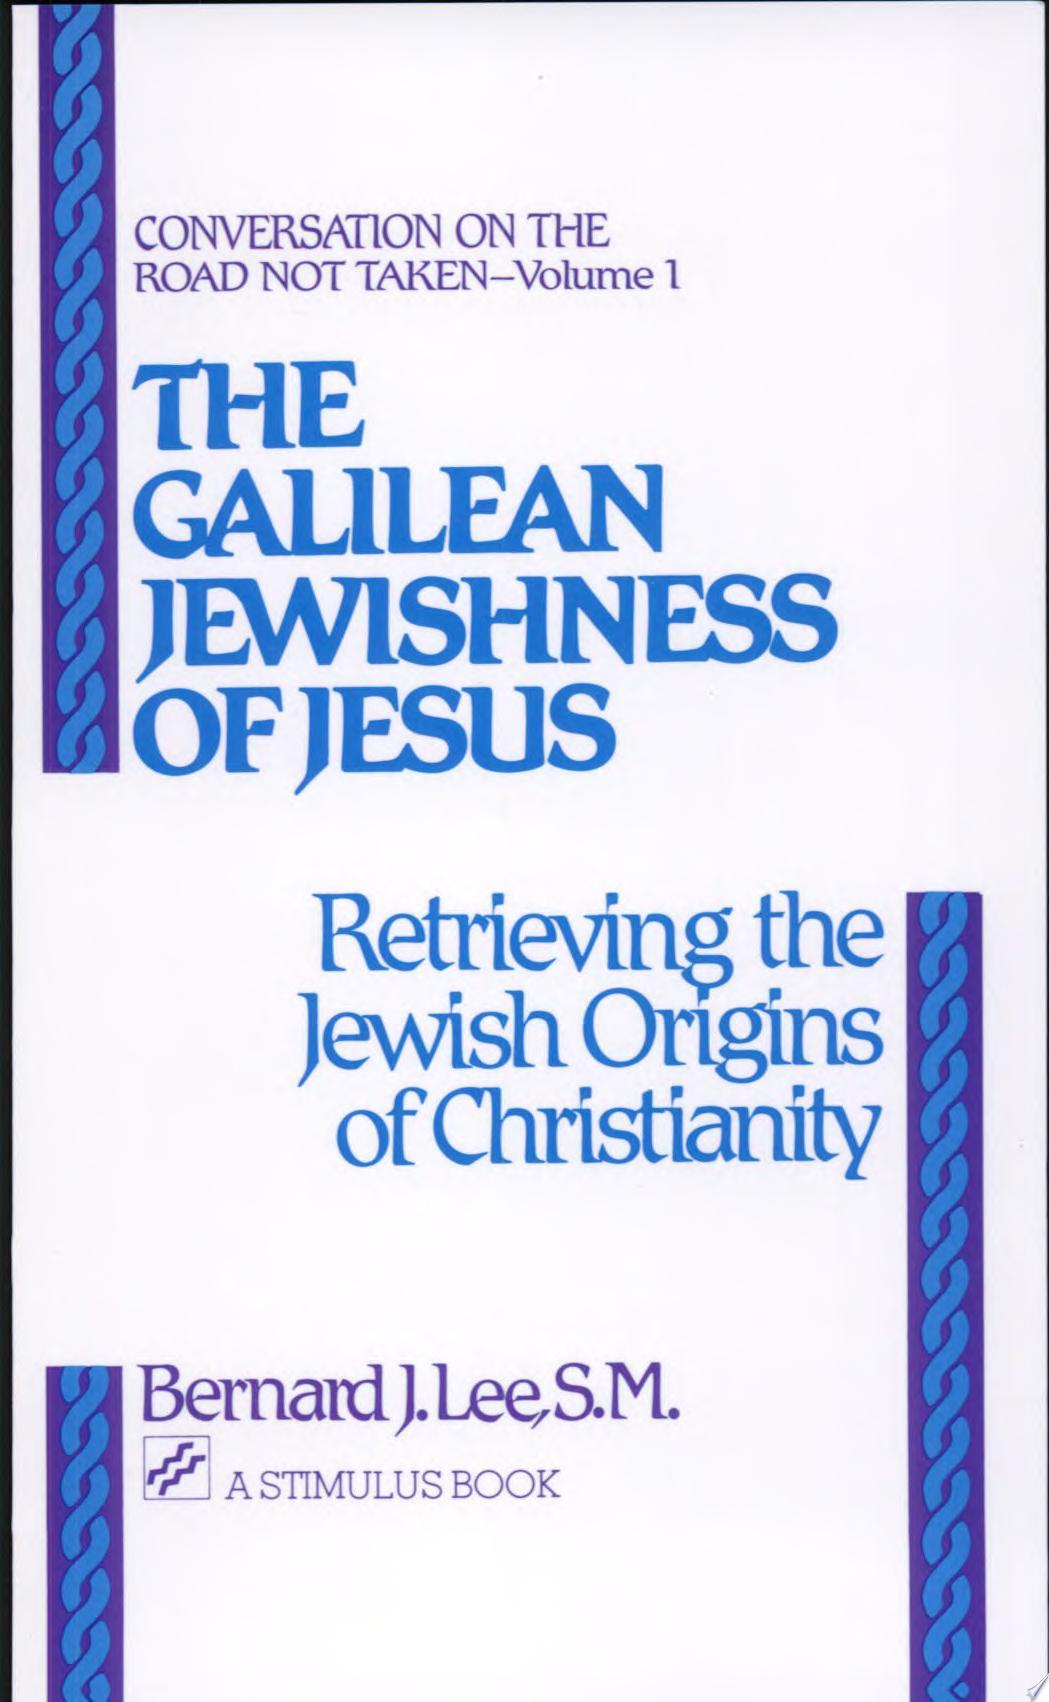 The Galilean Jewishness of Jesus